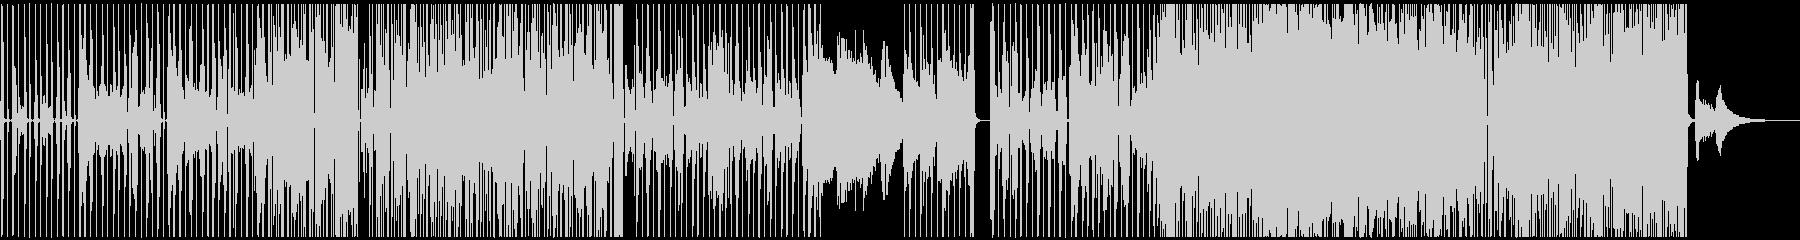 SAYONARA INAGOの未再生の波形